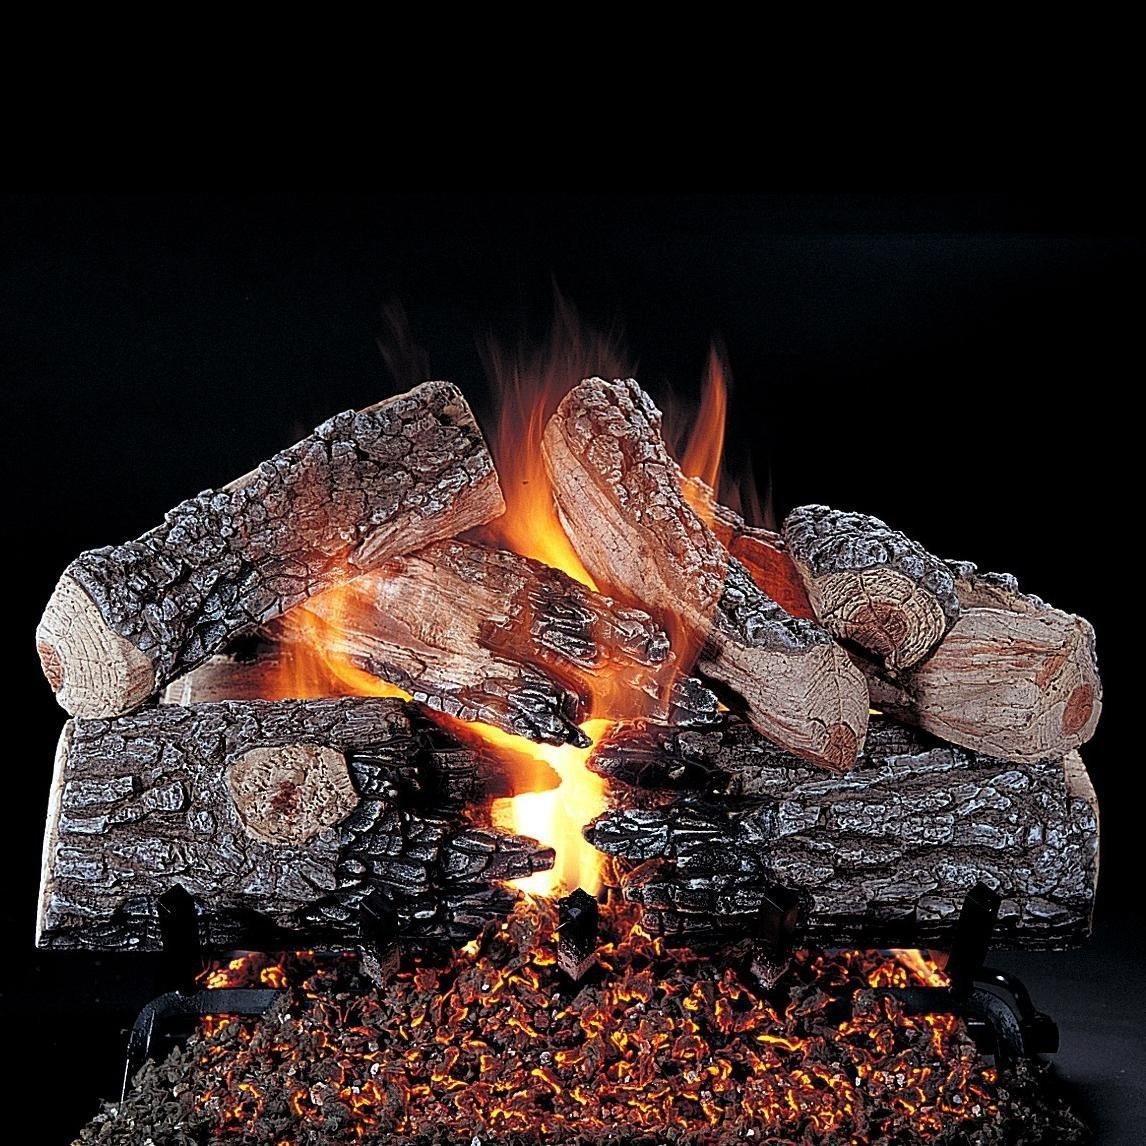 Rasmussen 30-inch Evening Prestige Gas Log Set With Vented Natural Gas Custom Pan Burner - Variable Flame Remote